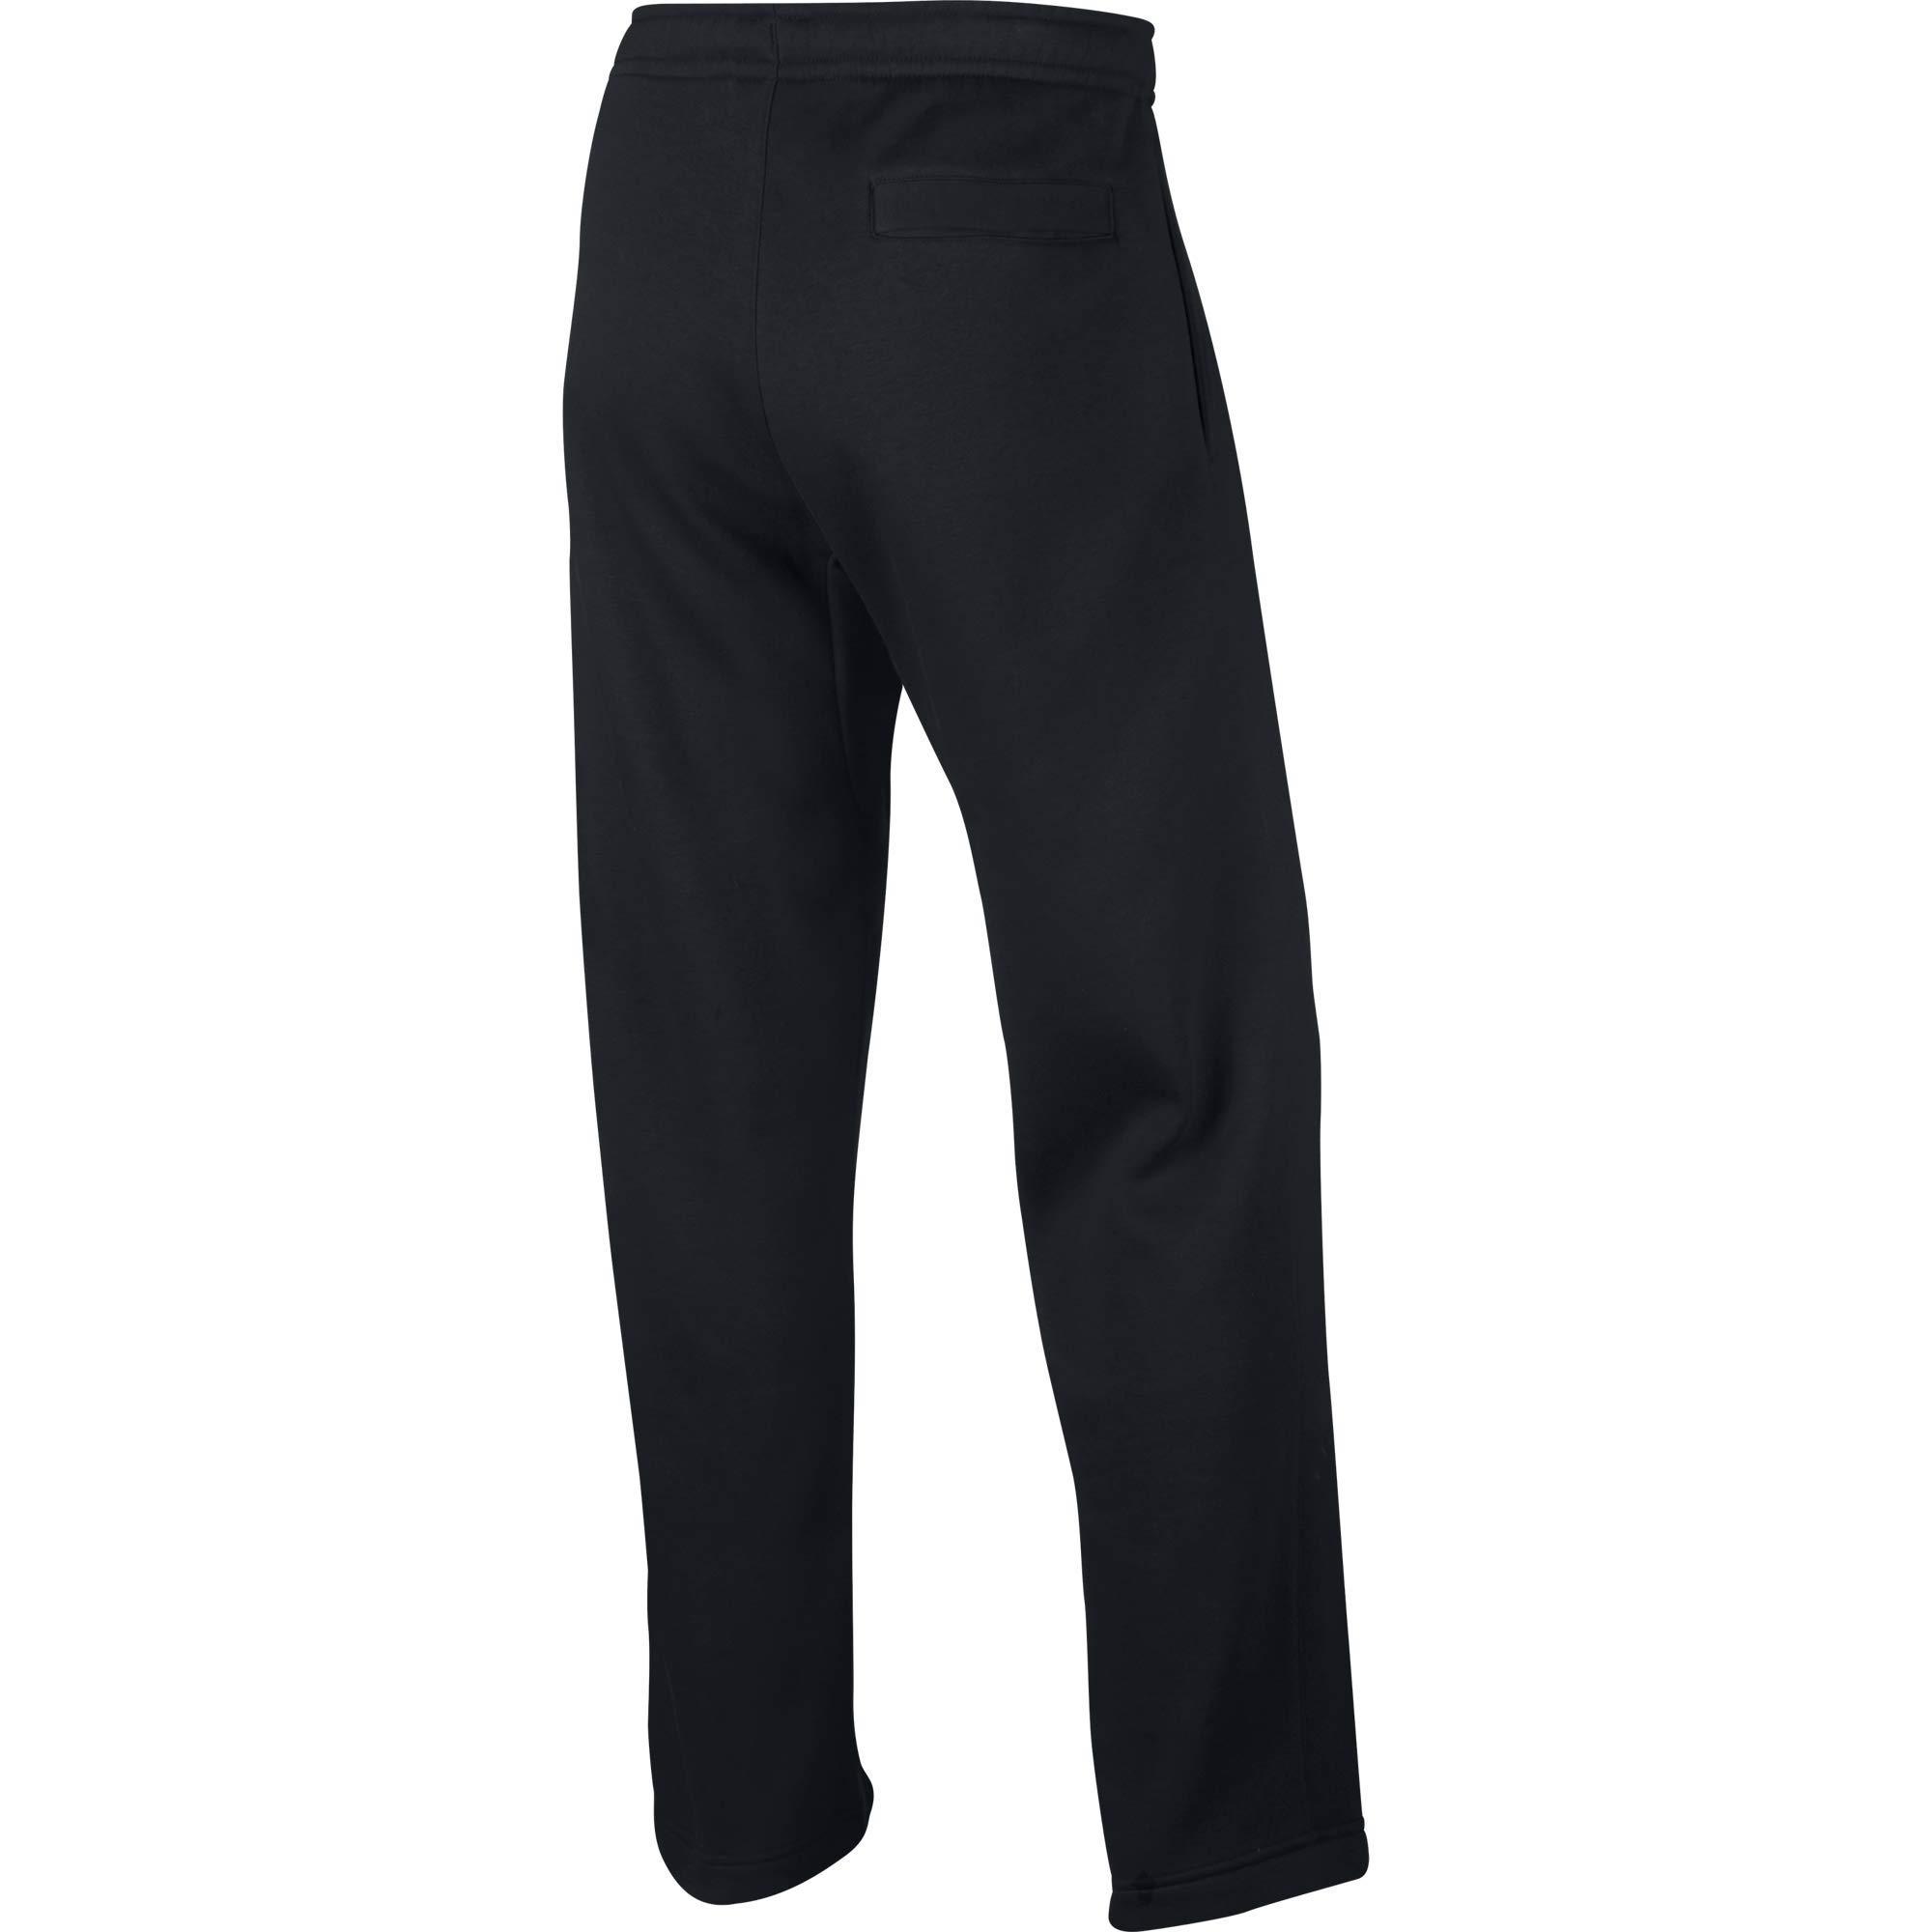 Nike Men's Sportswear Open Hem Club Pants, Black/White, Small